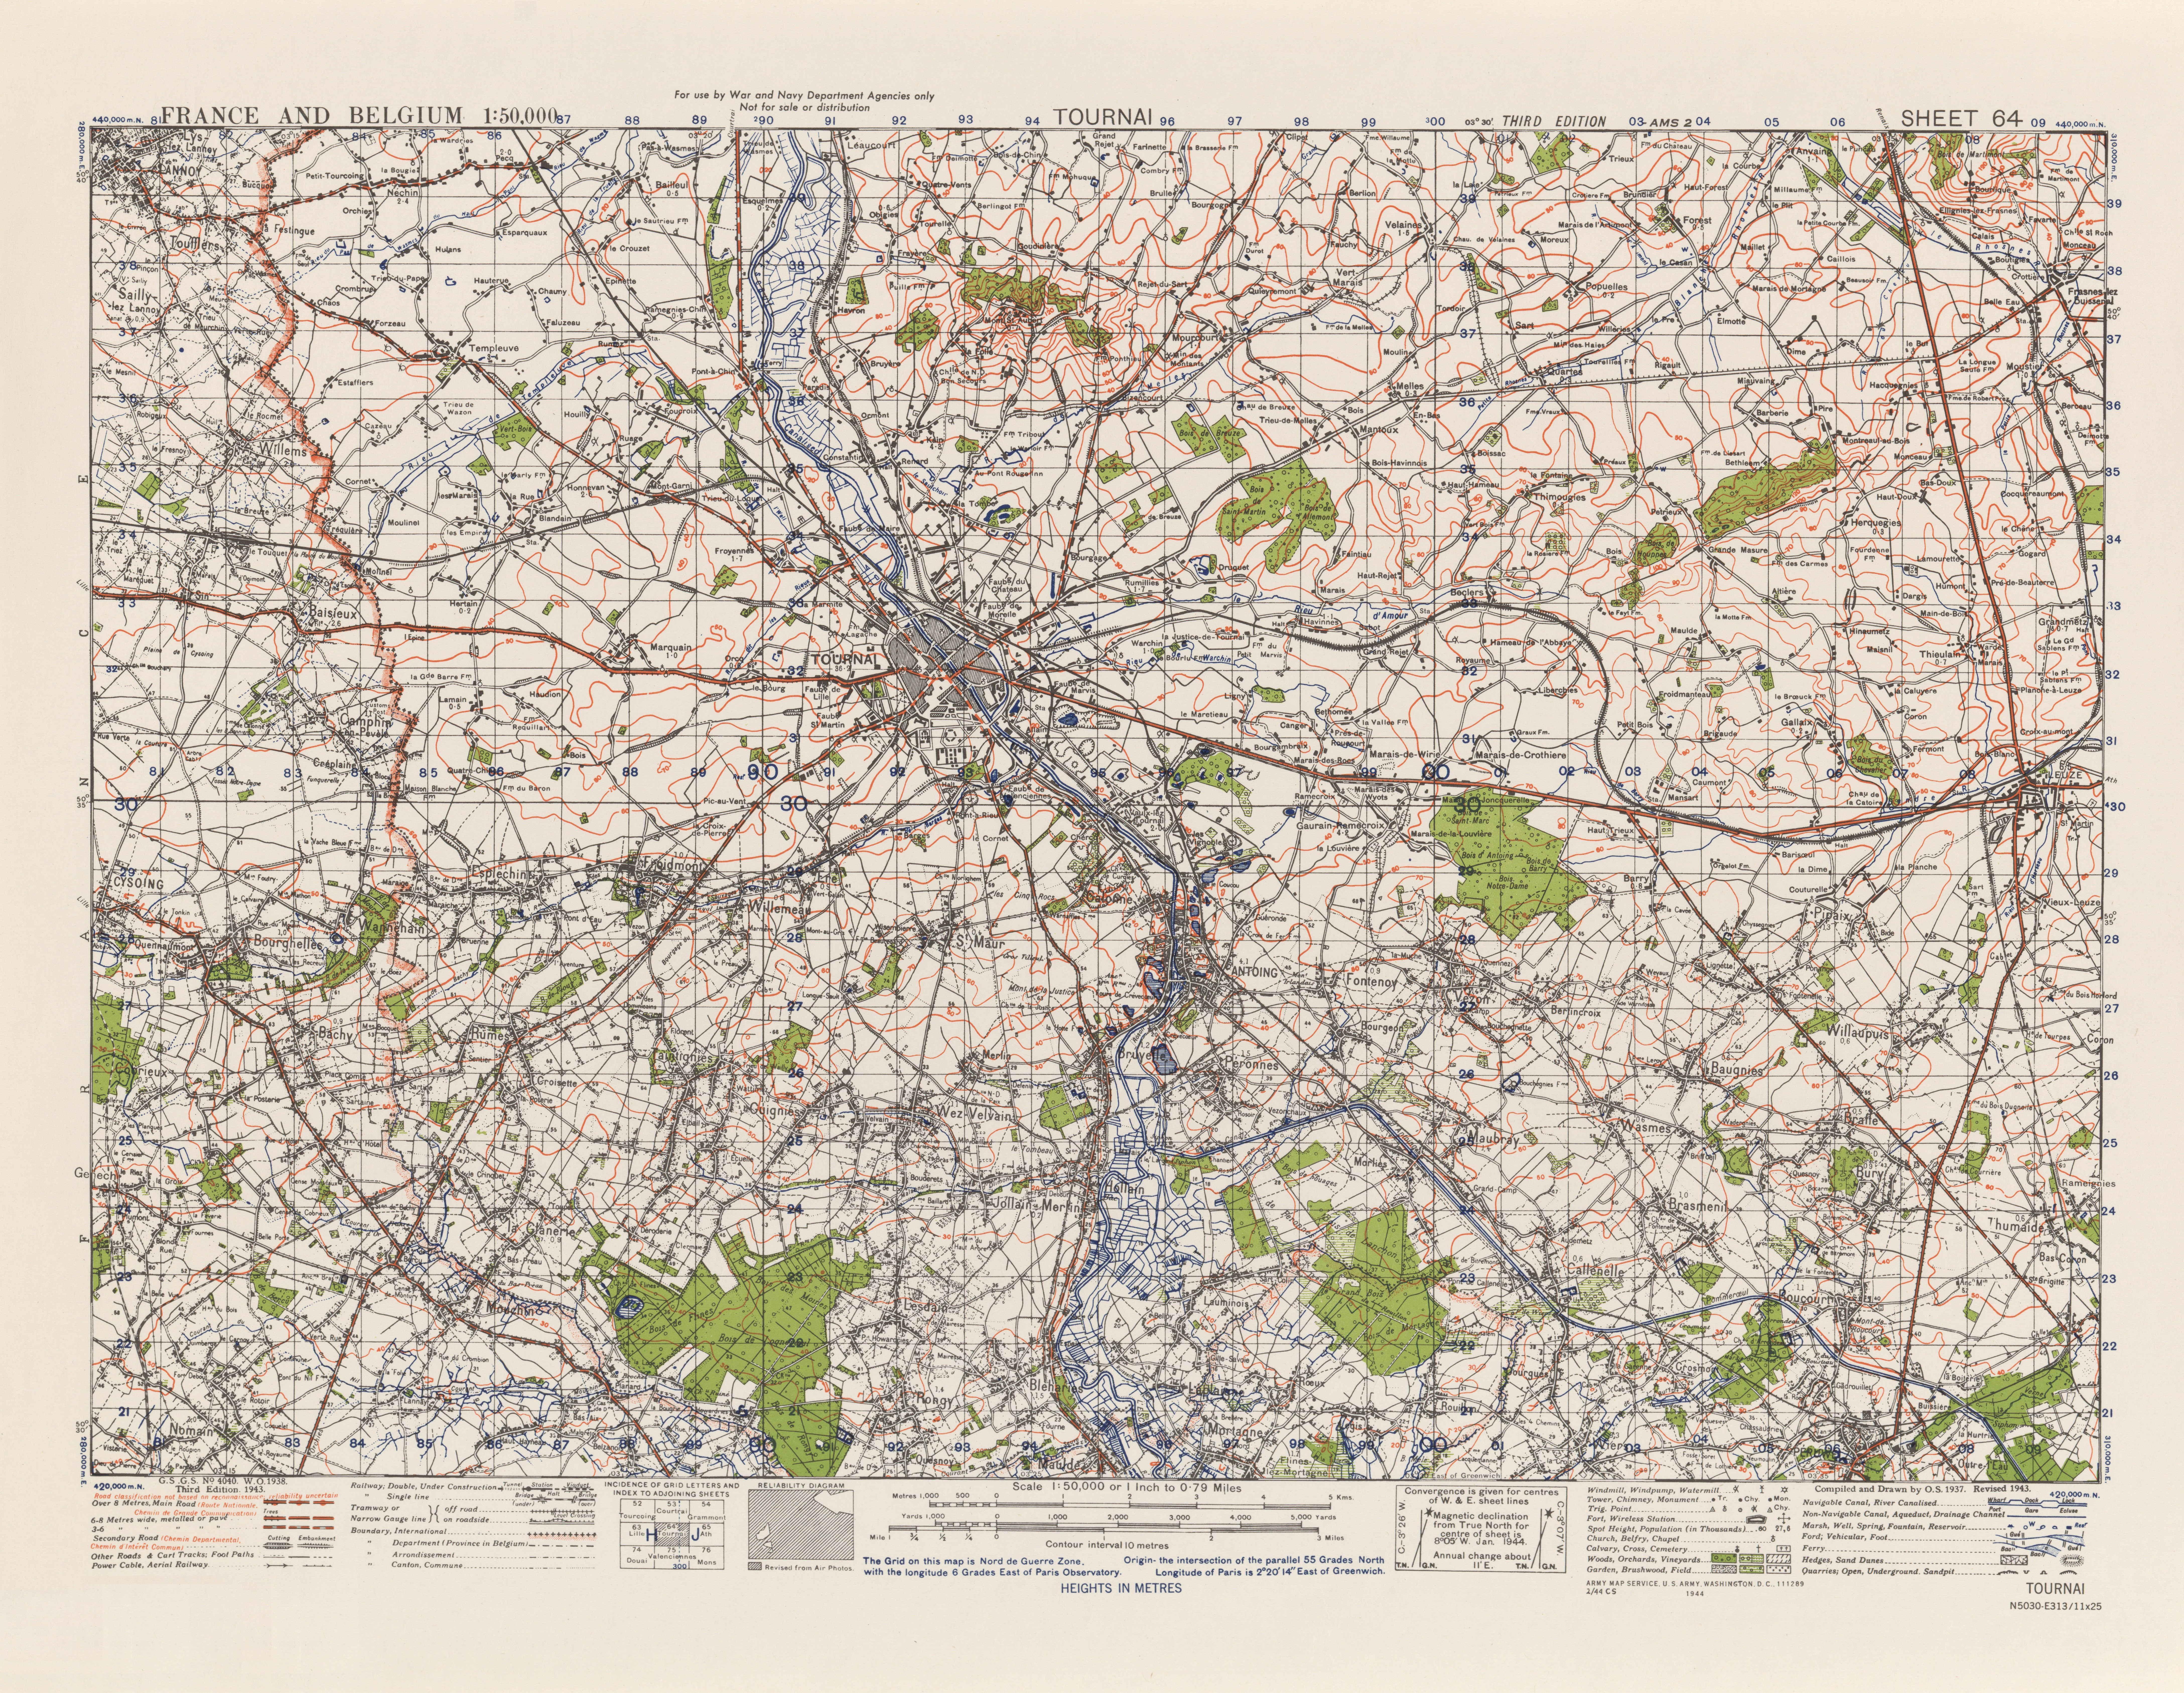 021A - 4040-Tournai-64